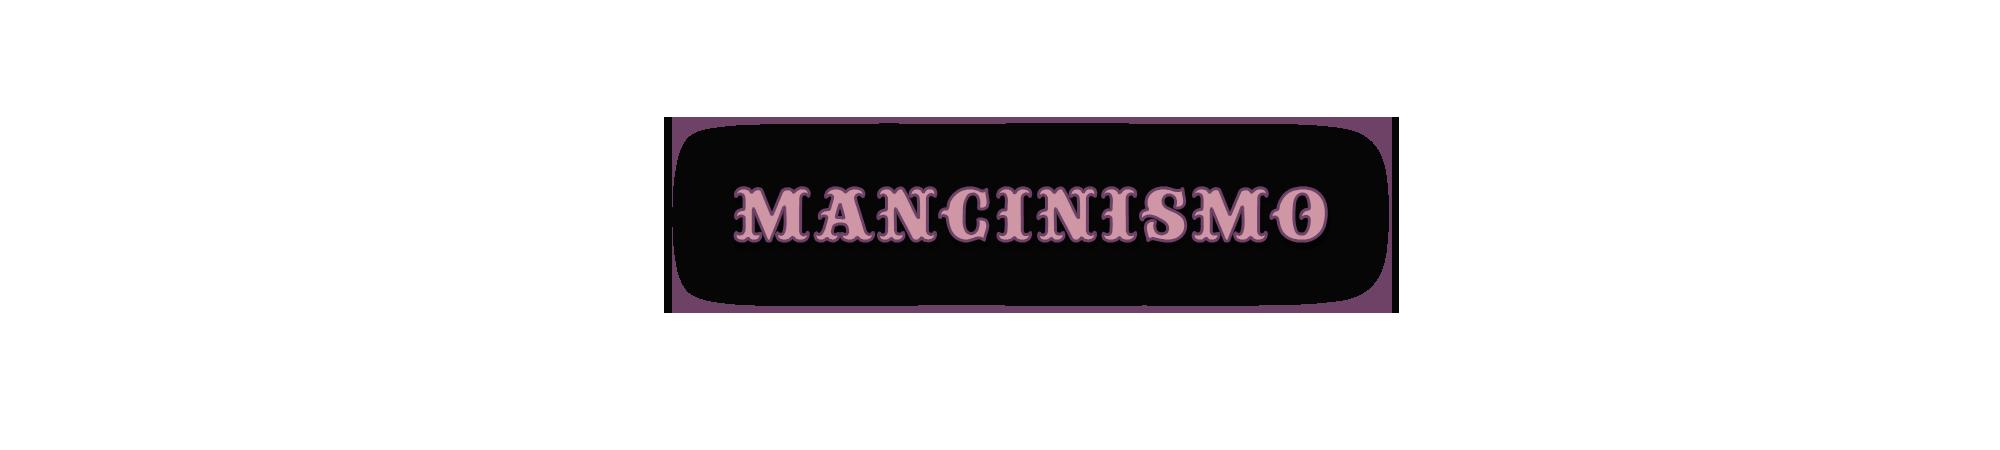 mancinismo